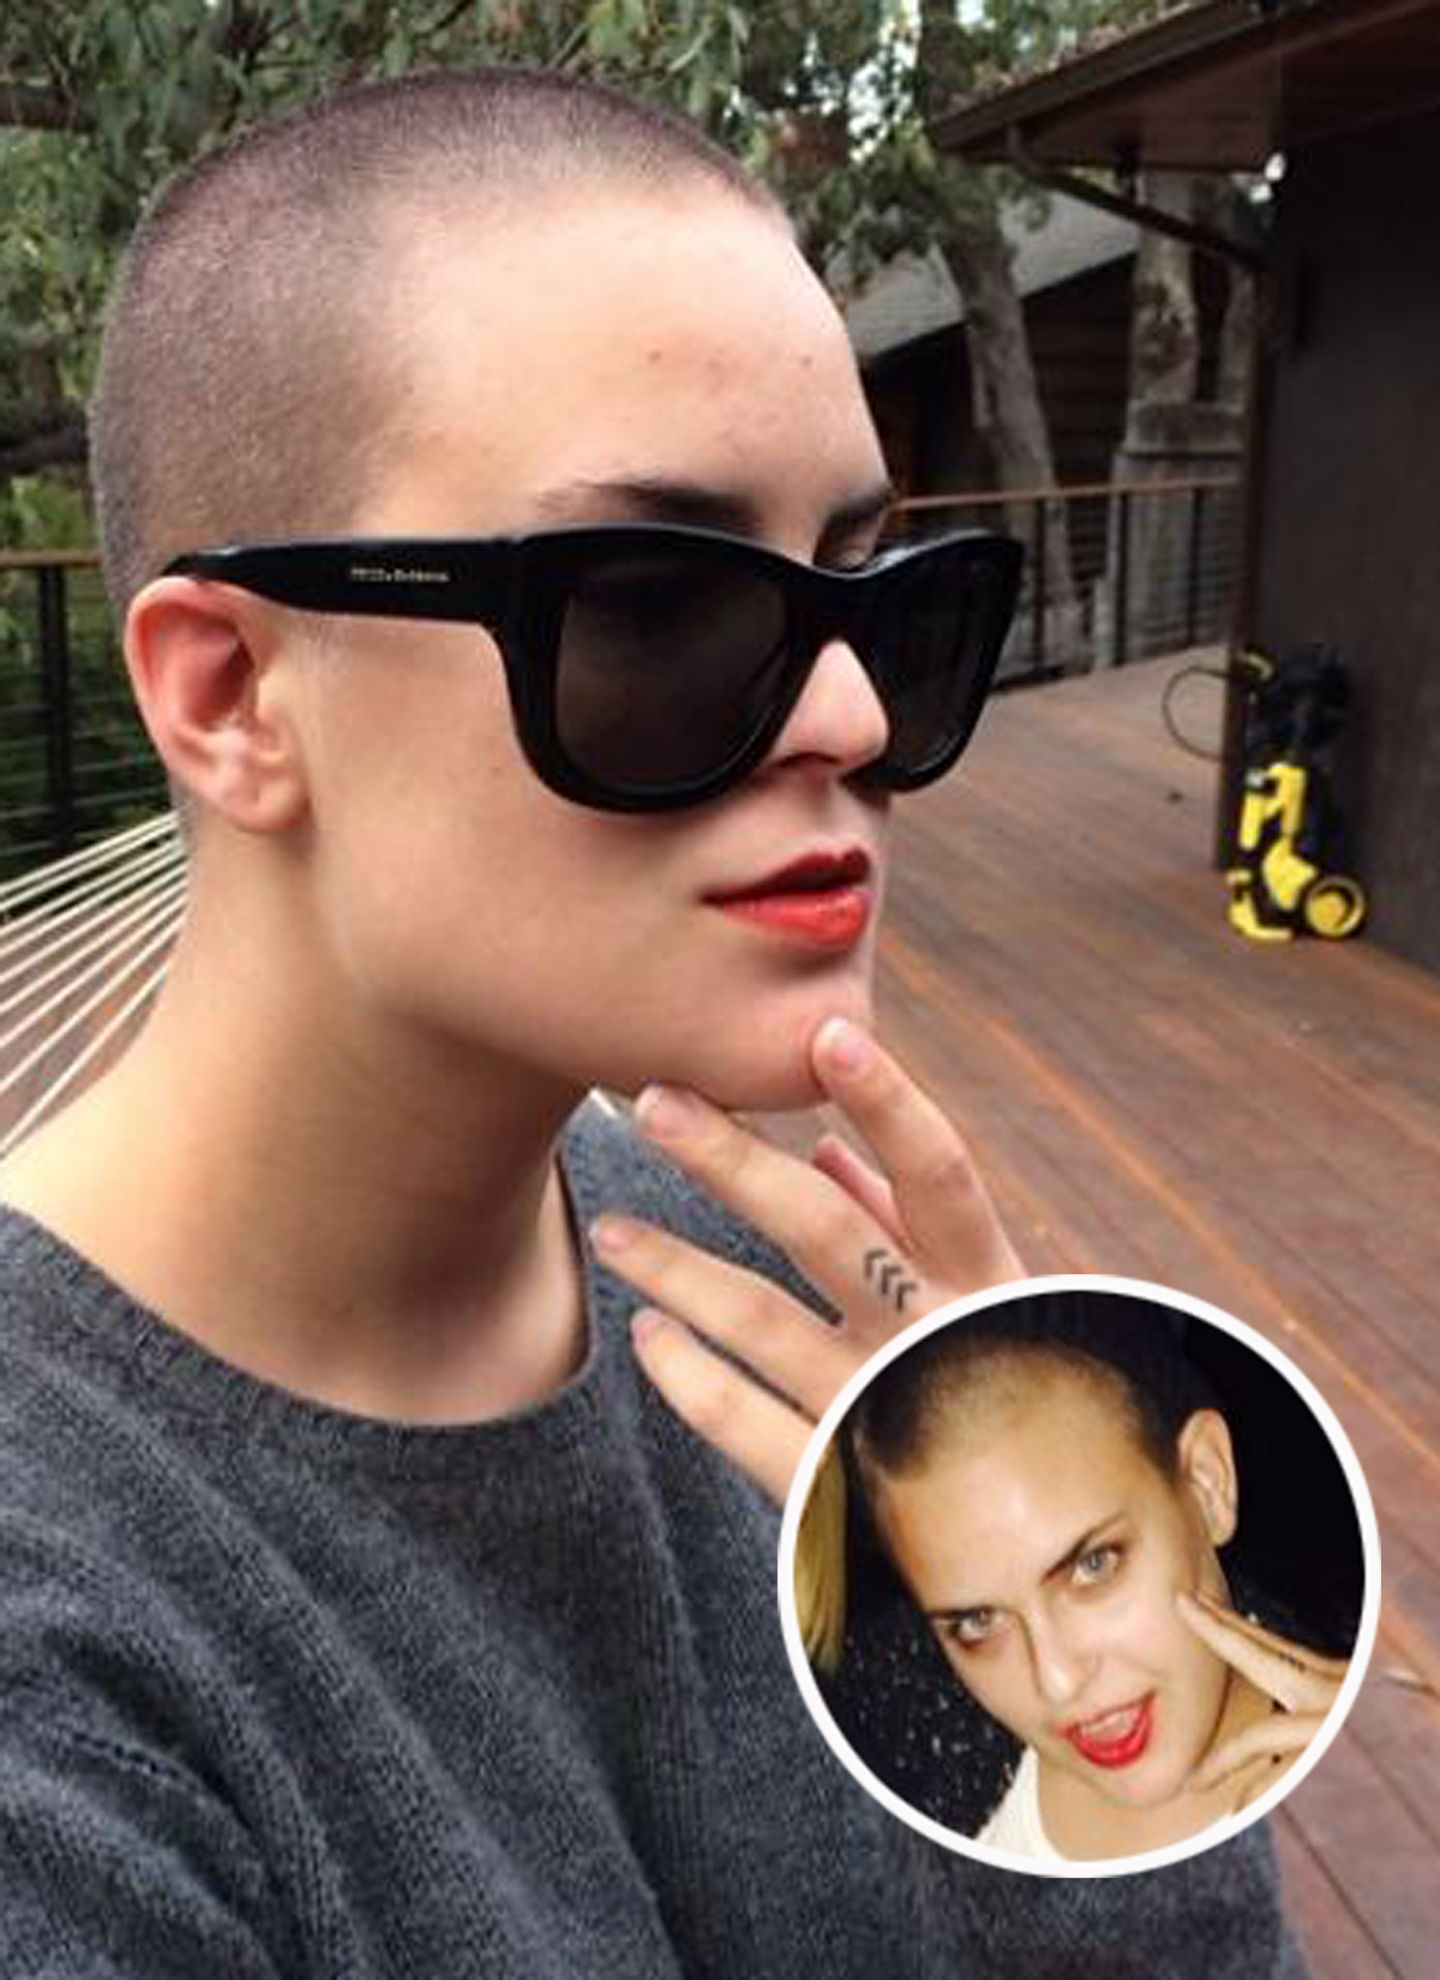 Sich glatze rasiert frau Kopfrasur: Haar